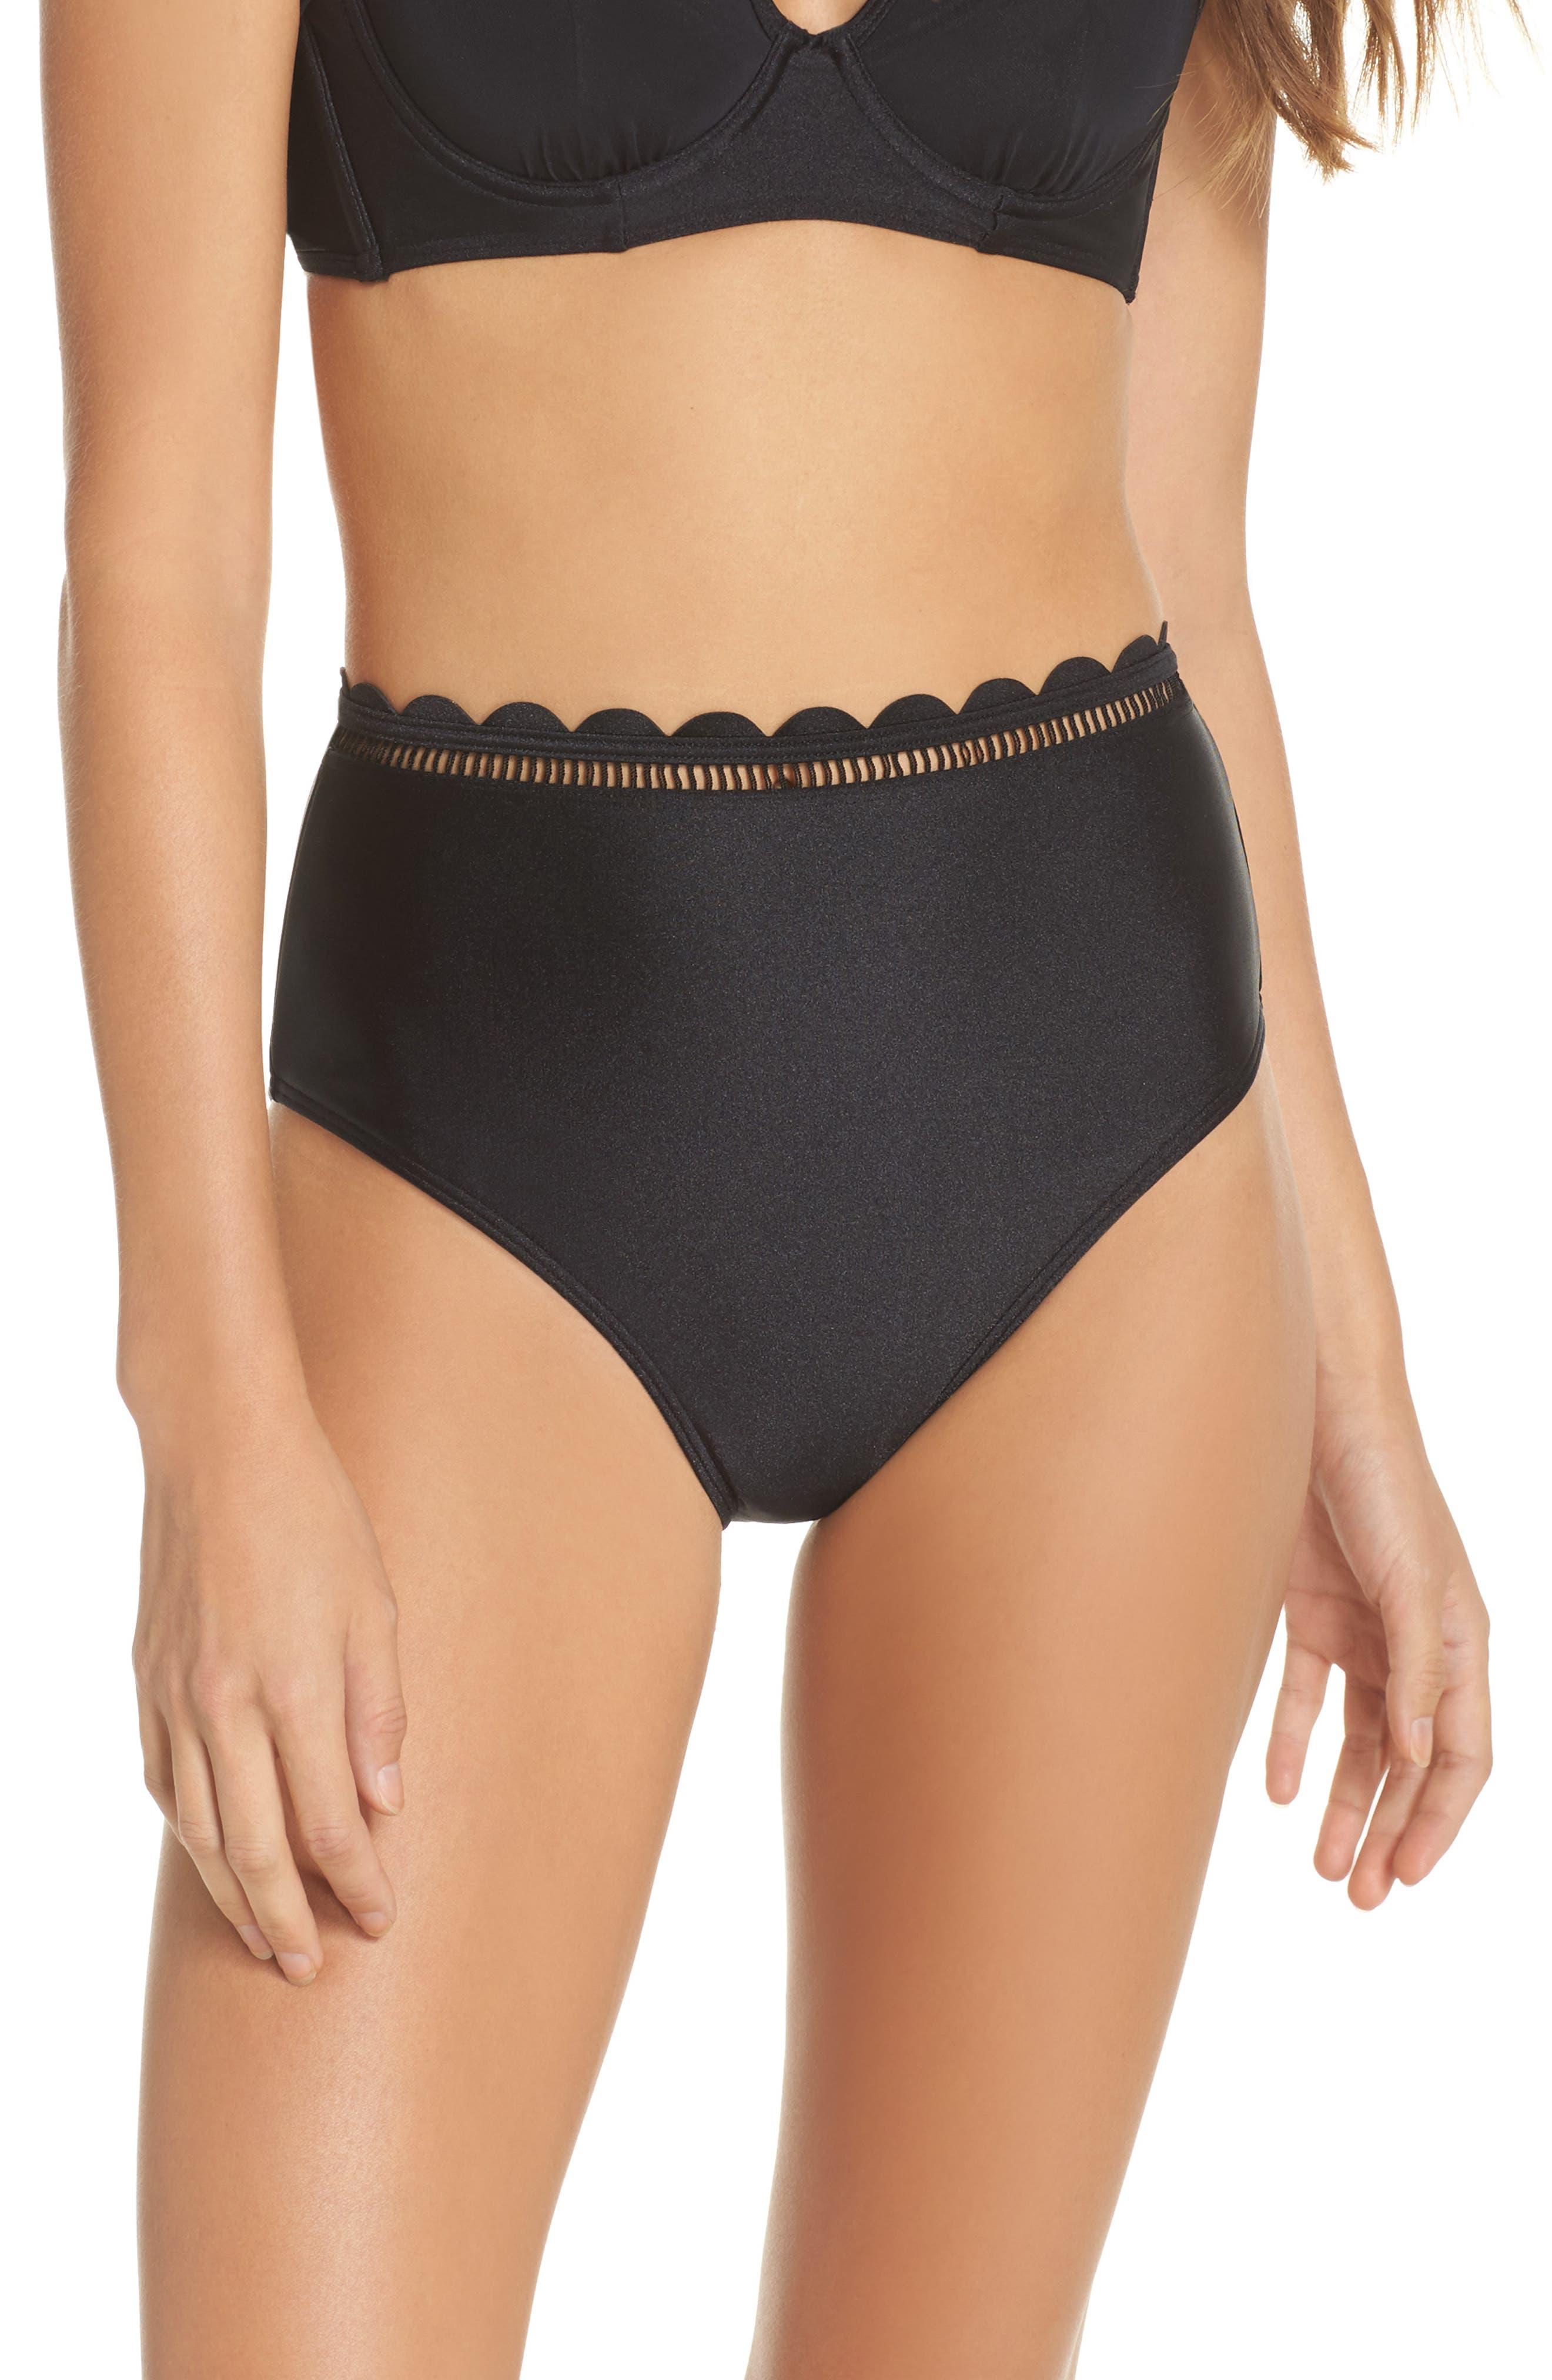 Scallop High Waist Bikini Bottoms,                             Main thumbnail 1, color,                             Black